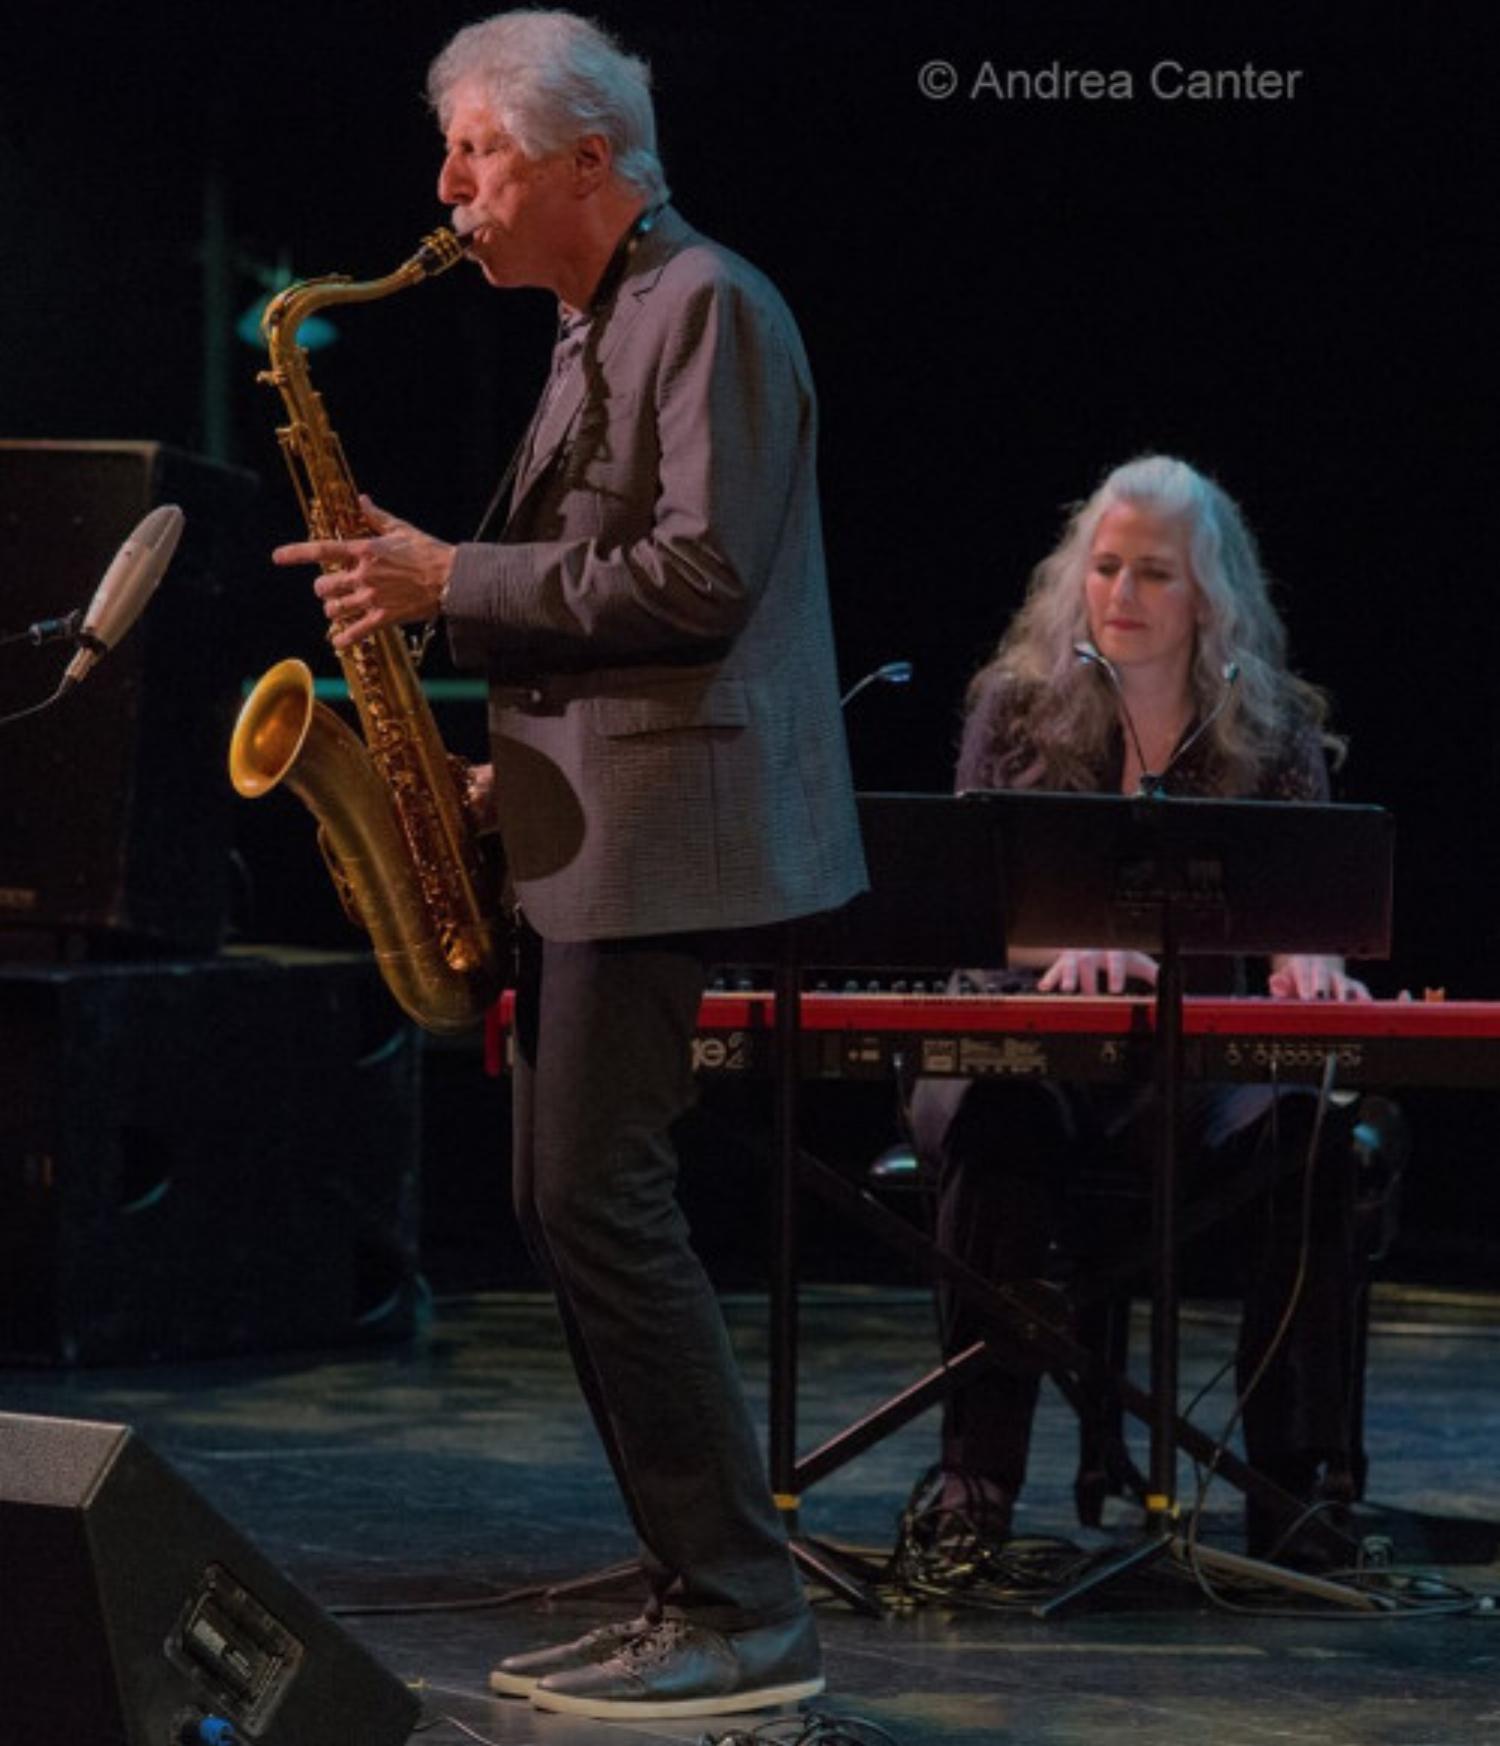 Pianist Mary Louise Knutson with saxophonist Bob Mintzer, Minneapolis, MN.